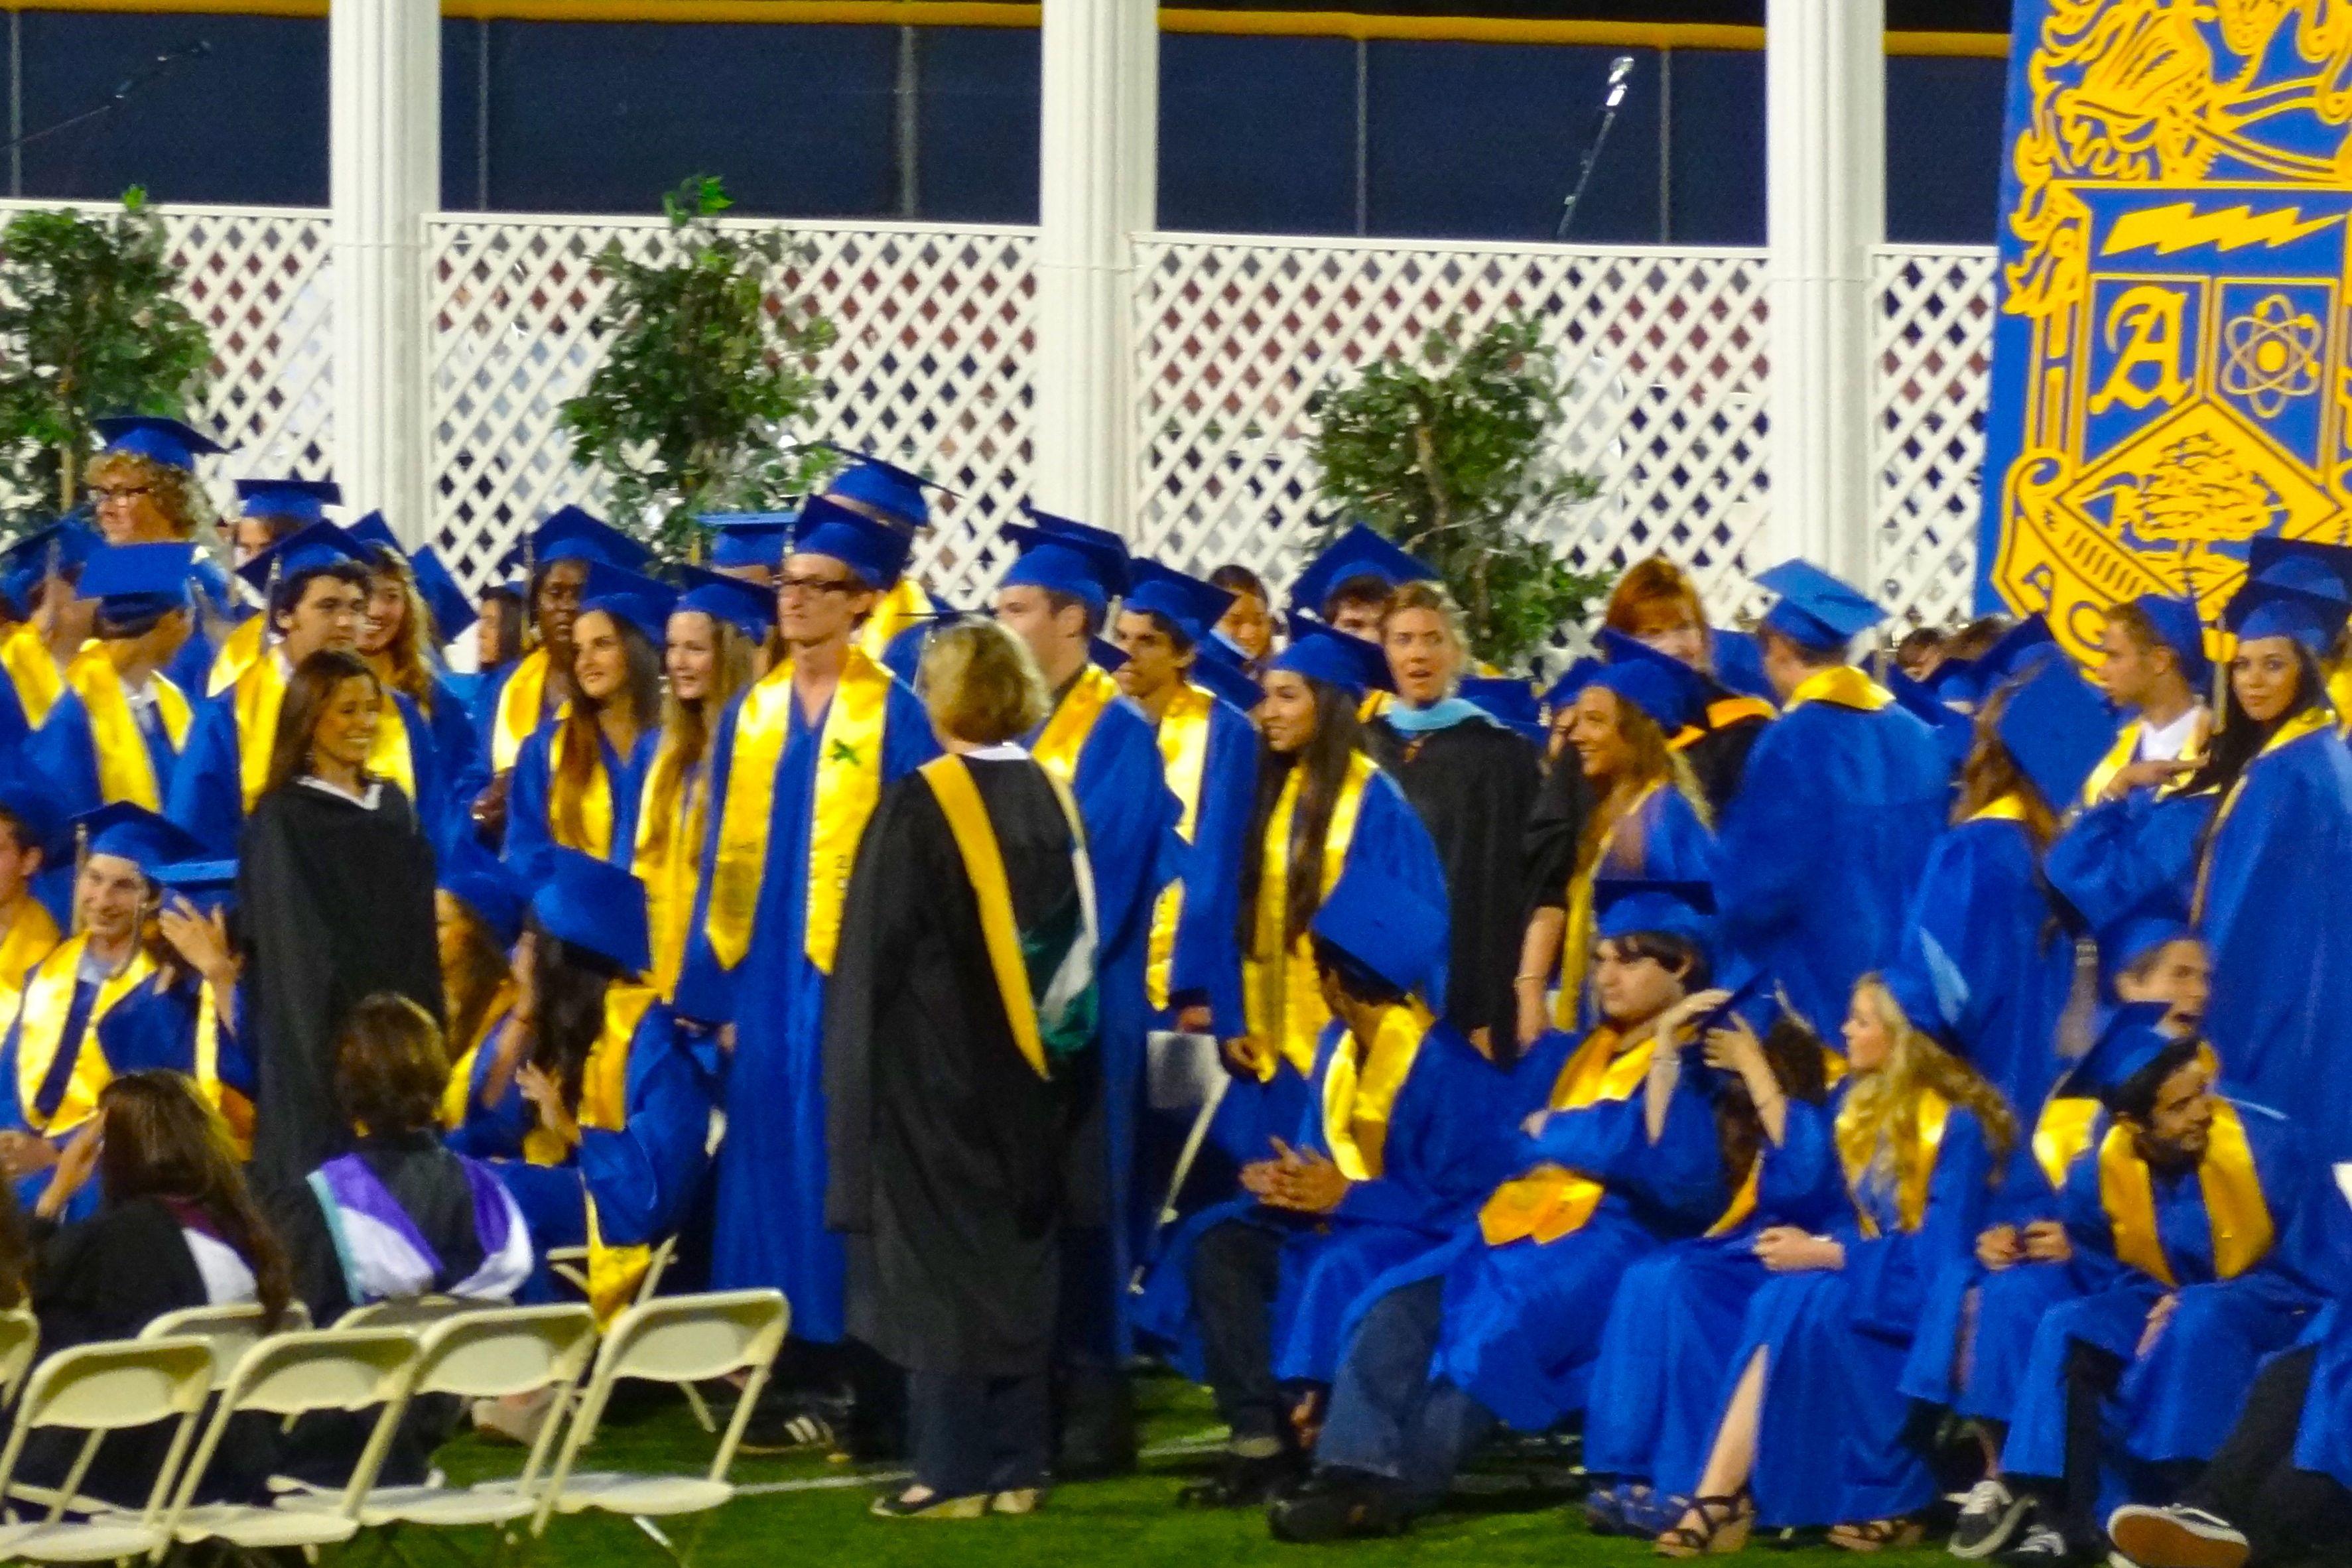 Graduating High School?